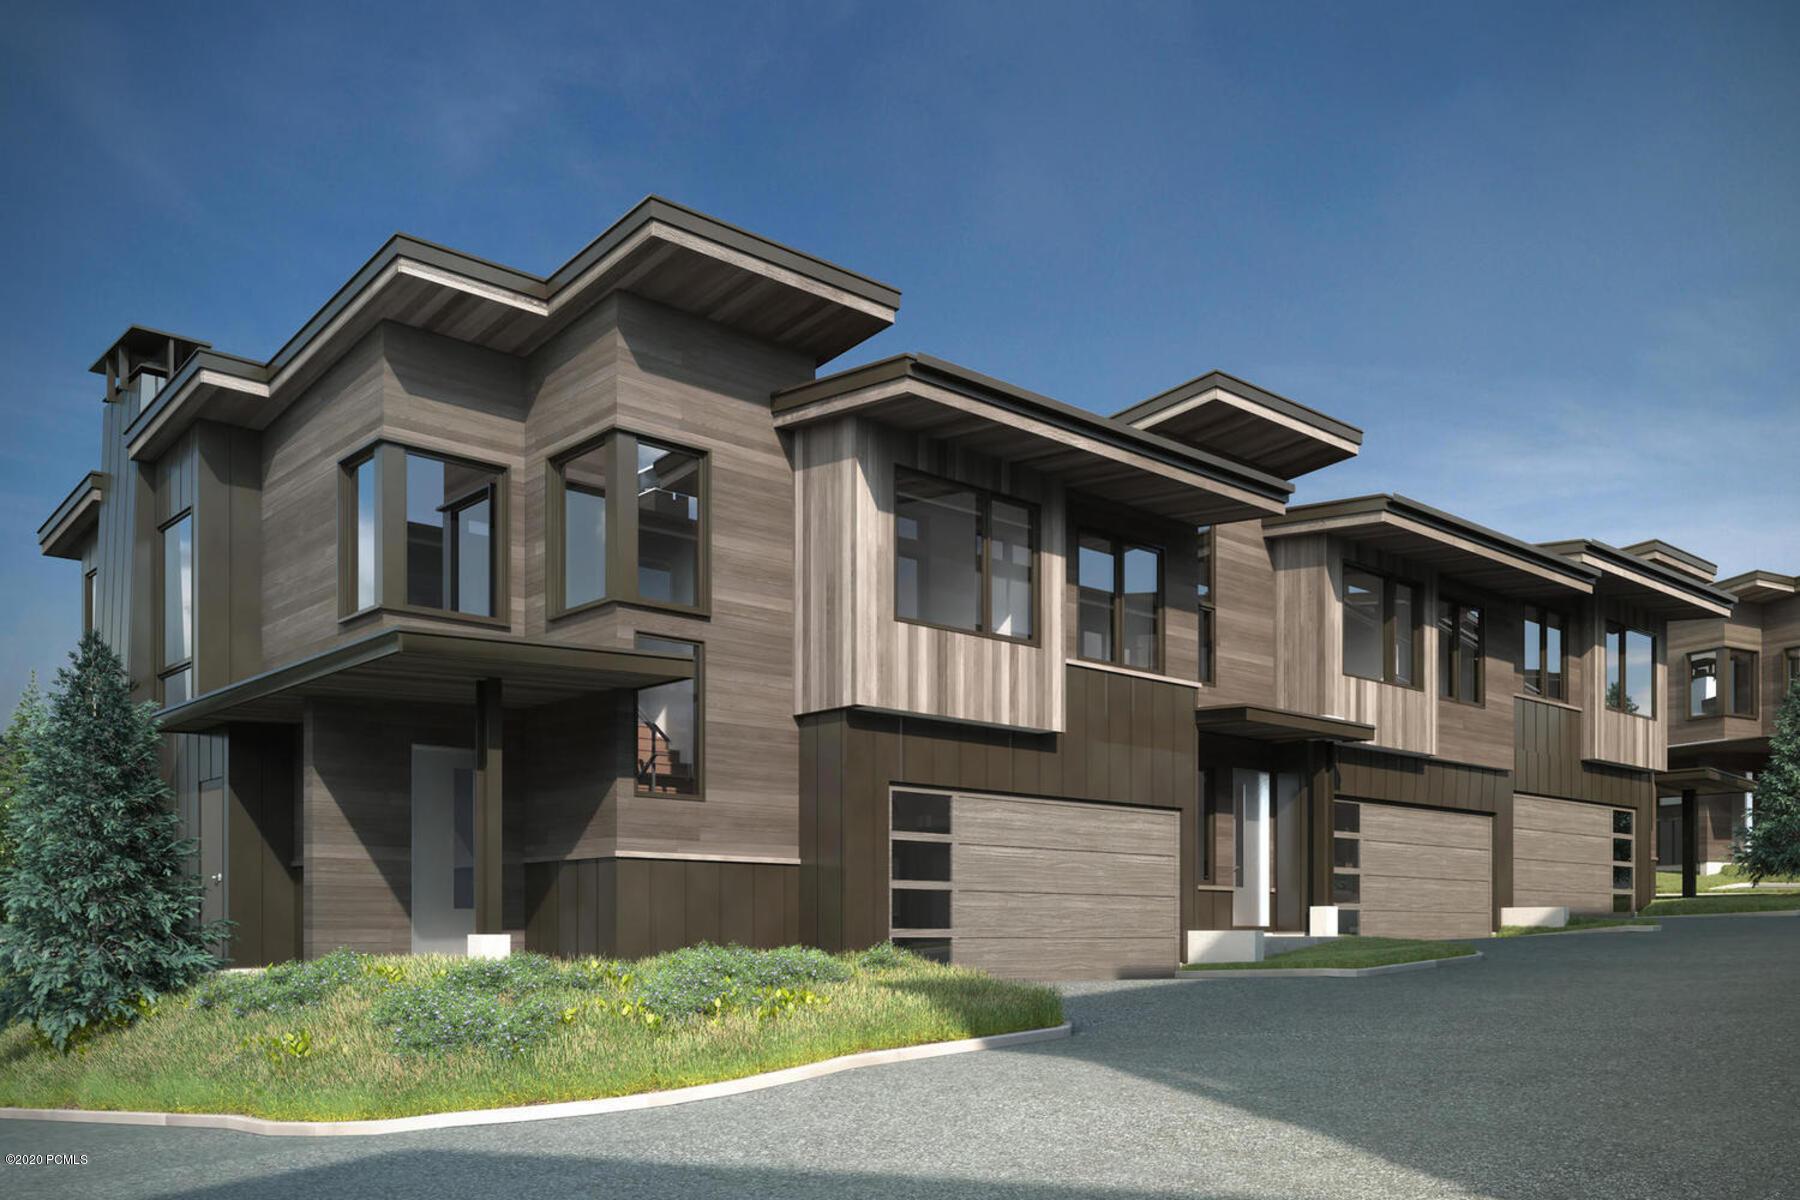 3526 Ridgeline Drive, Park City, Utah 84098, 4 Bedrooms Bedrooms, ,5 BathroomsBathrooms,Condominium,For Sale,Ridgeline,12003766